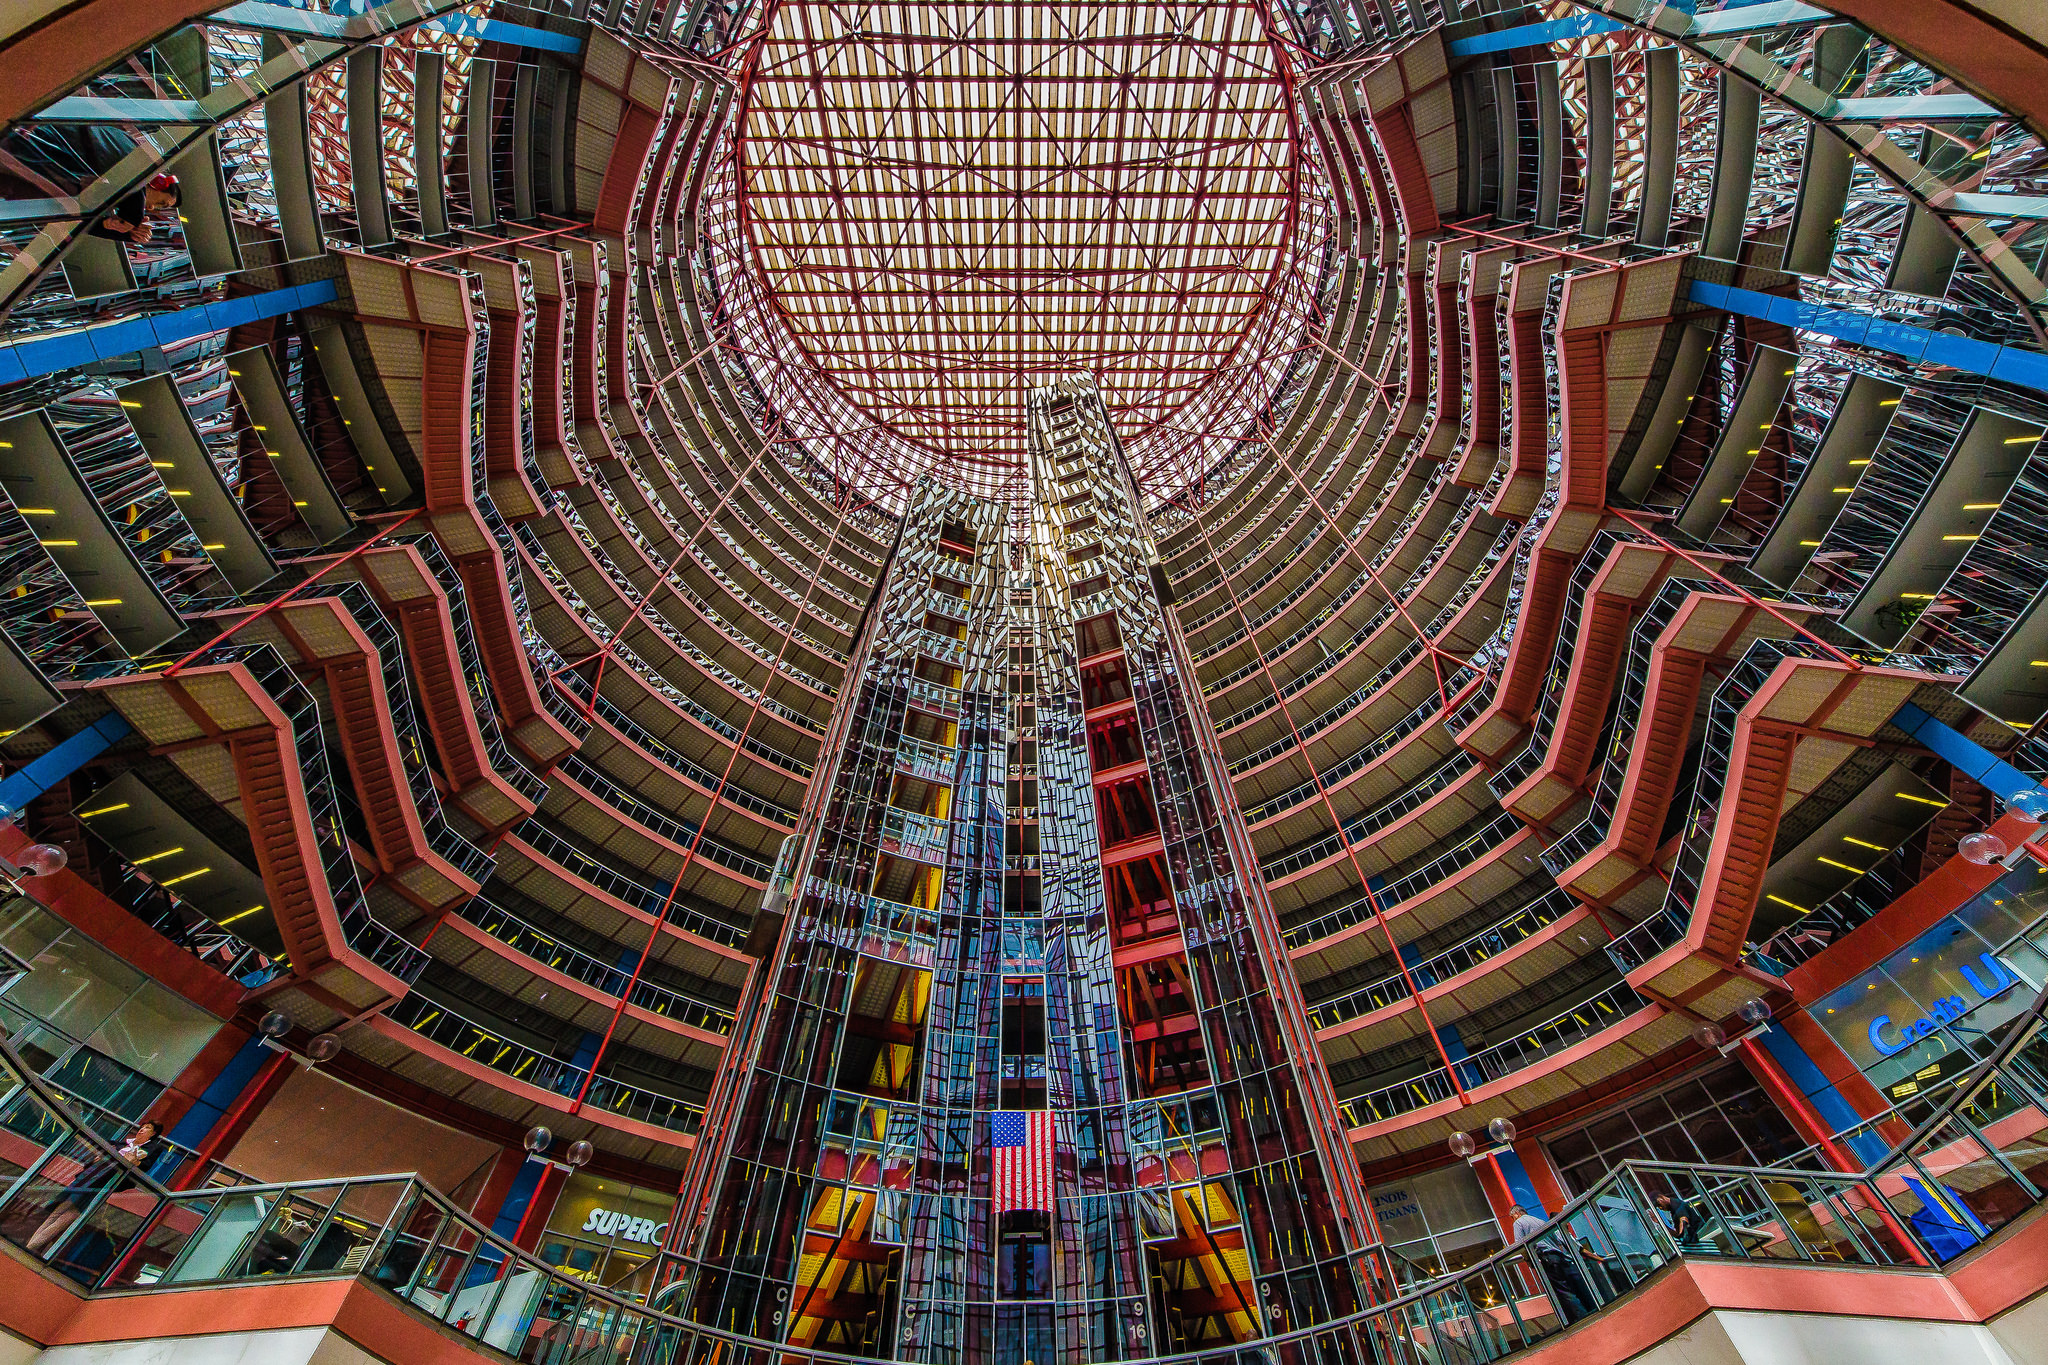 James R. Thompson Center Atrium, photo by  Mobilus in Mobili  via Flickr